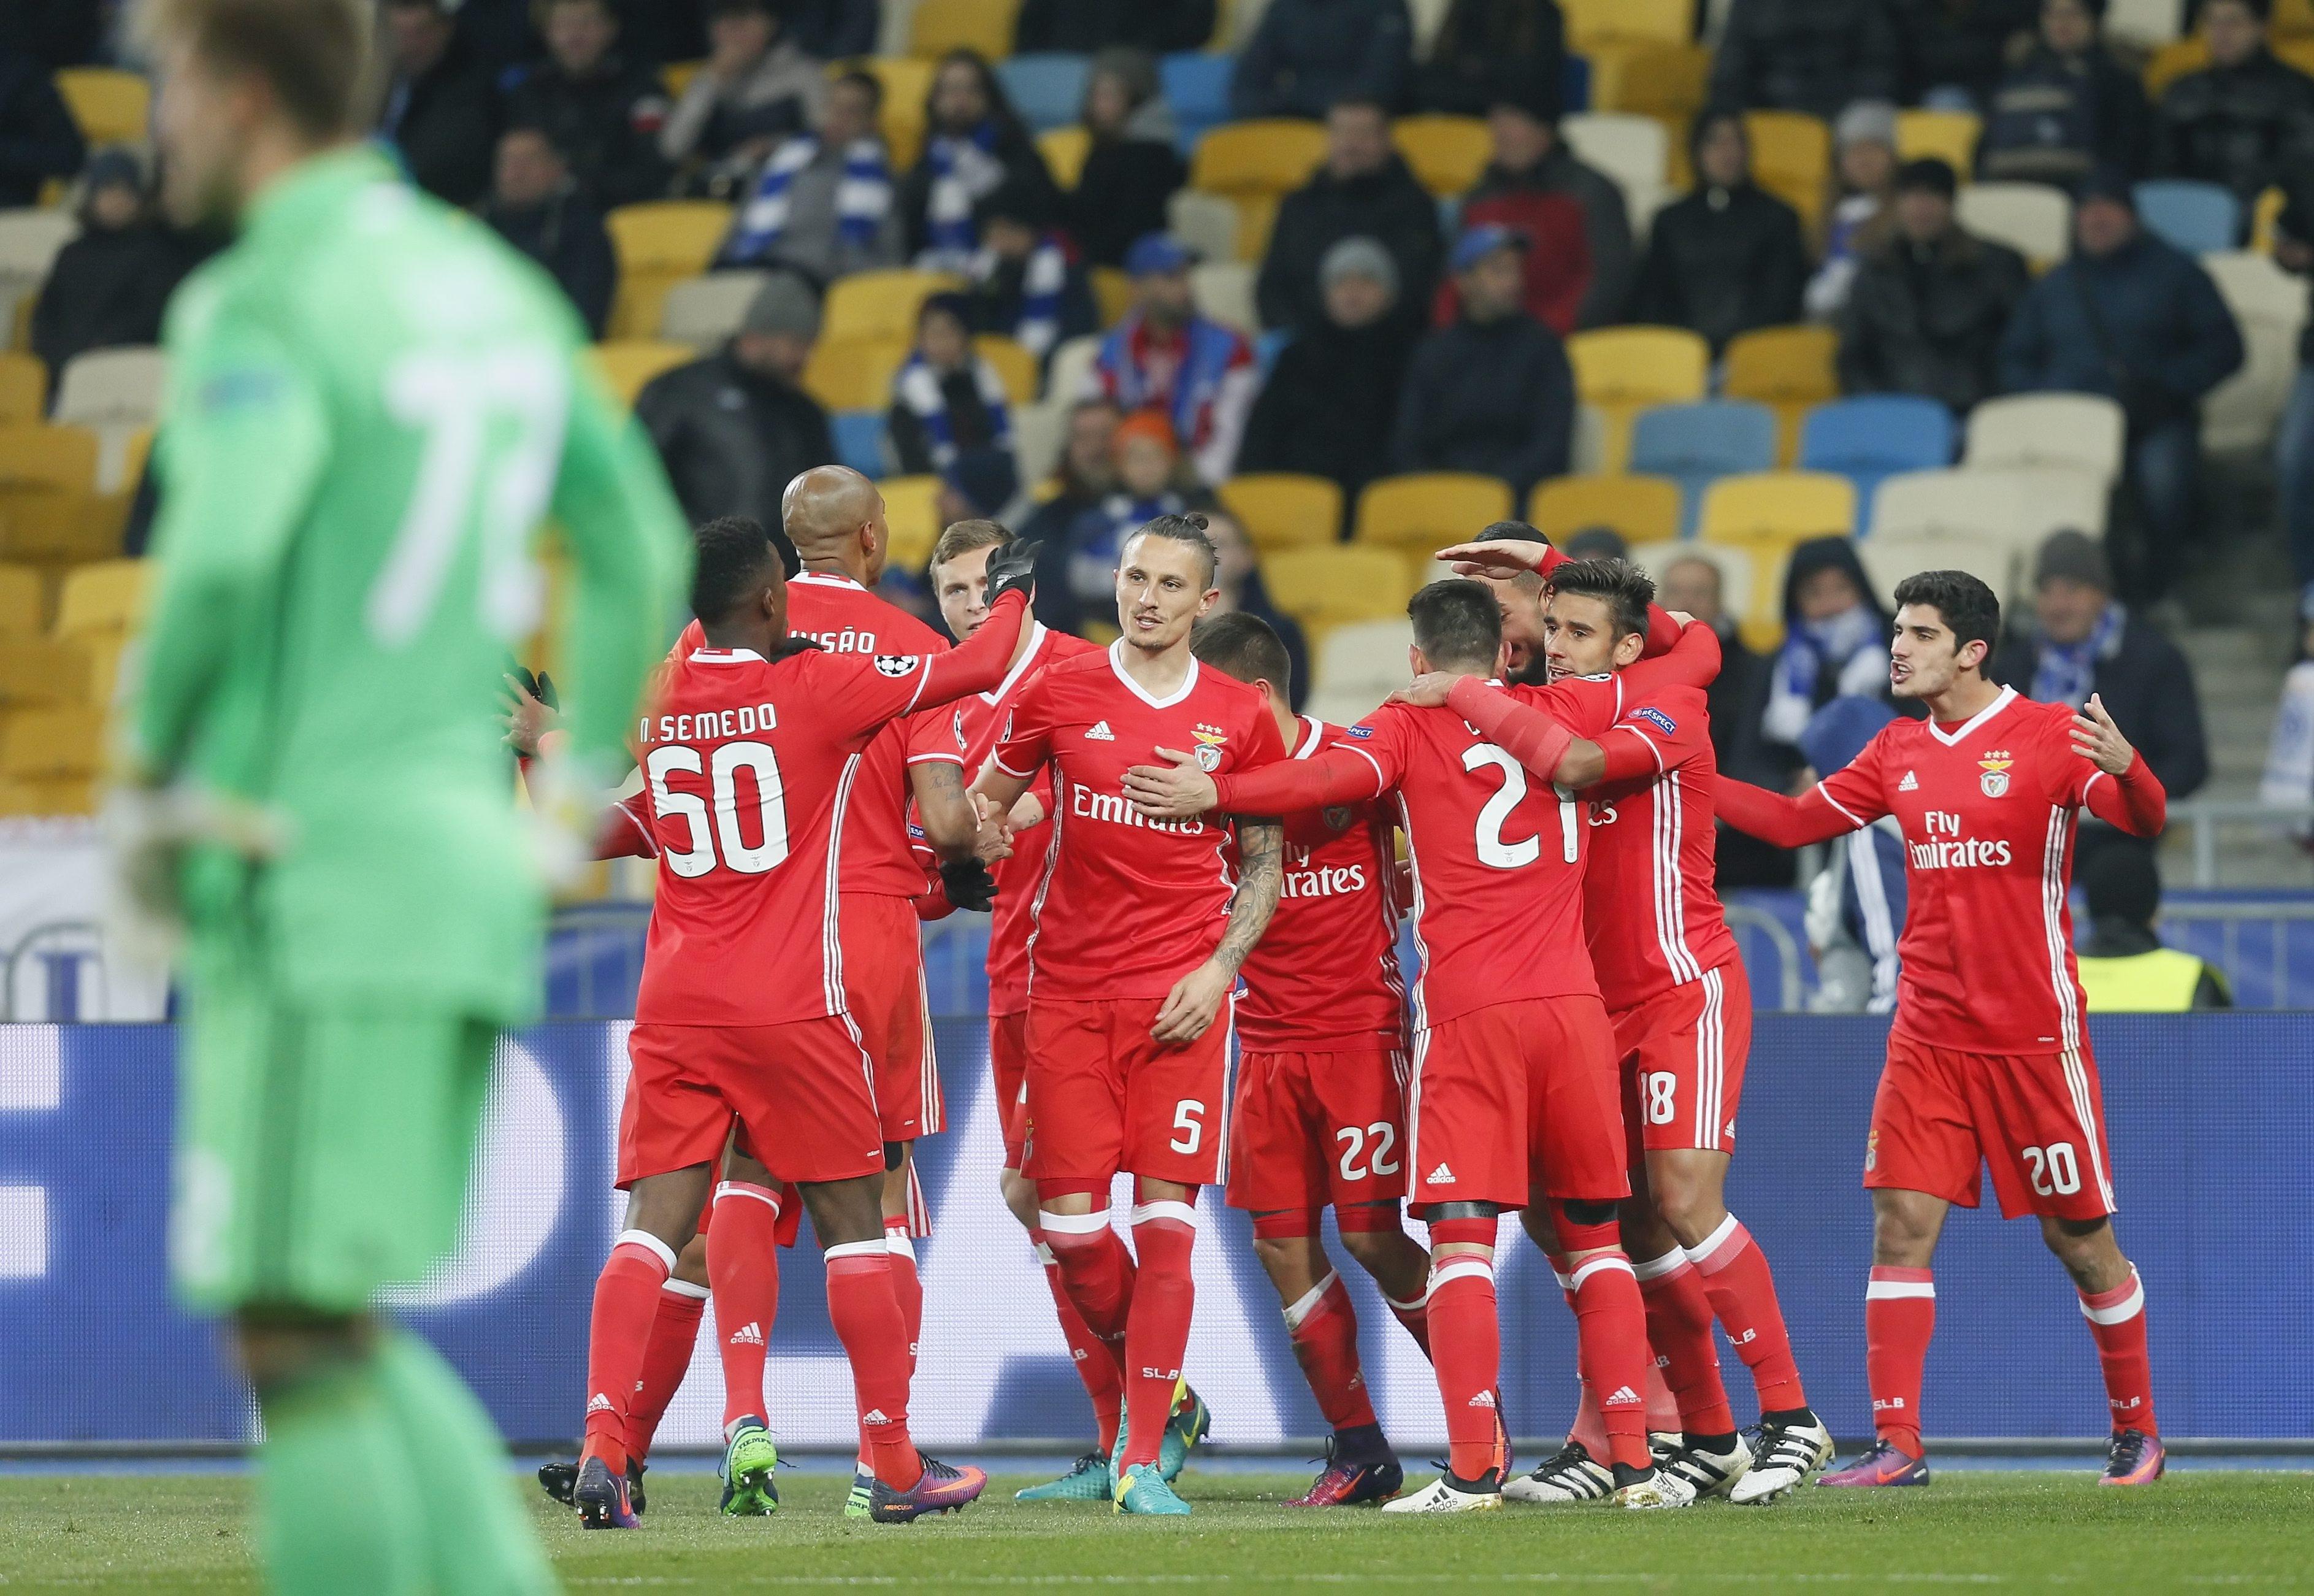 #LPDC7 : Sport Lisboa e Benfica (2/2)